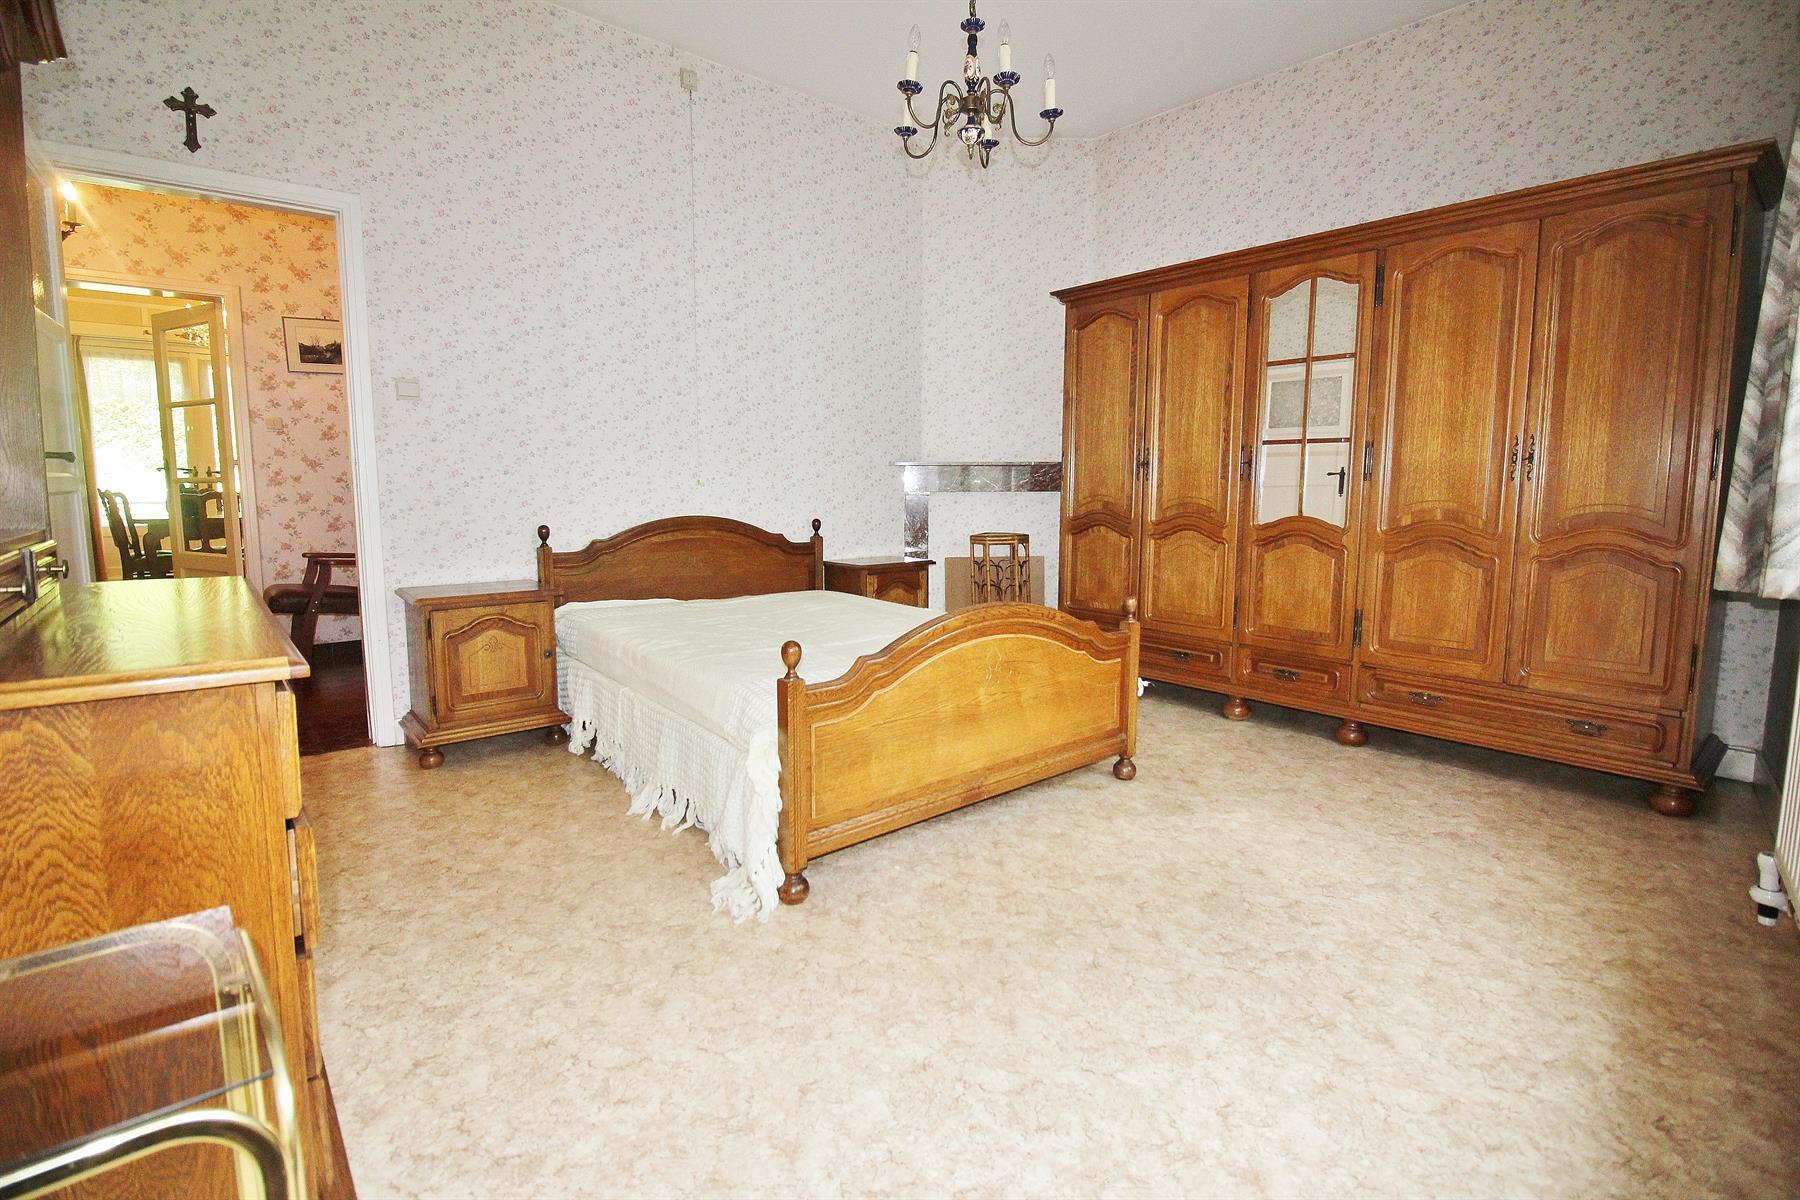 Bel-étage - Liege - #3470588-8